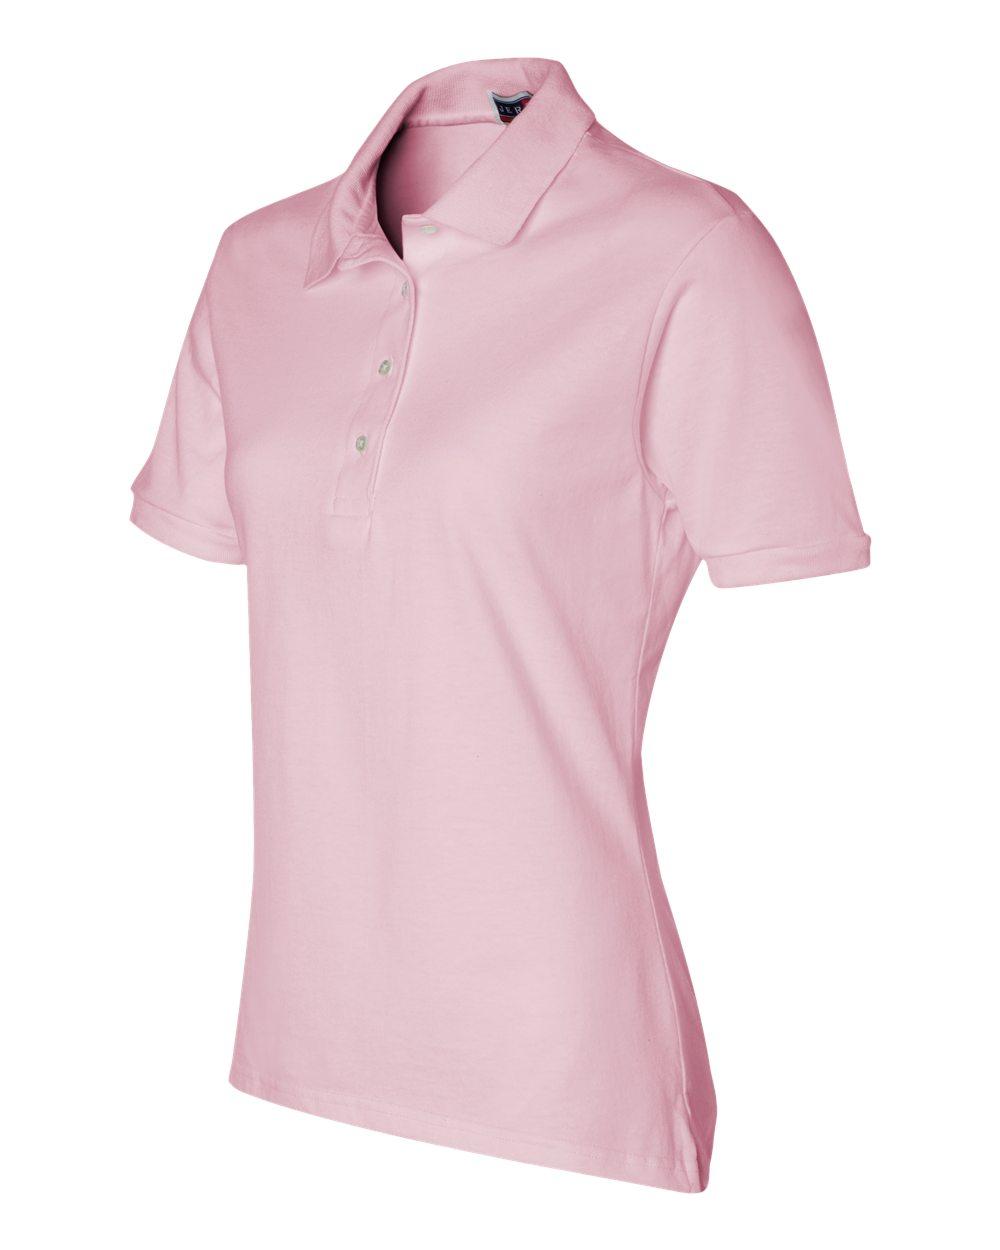 Jerzees-Womens-5-6-oz-50-50-Jersey-Polo-with-Spot-Shield-437W-Size-S-2XL thumbnail 13